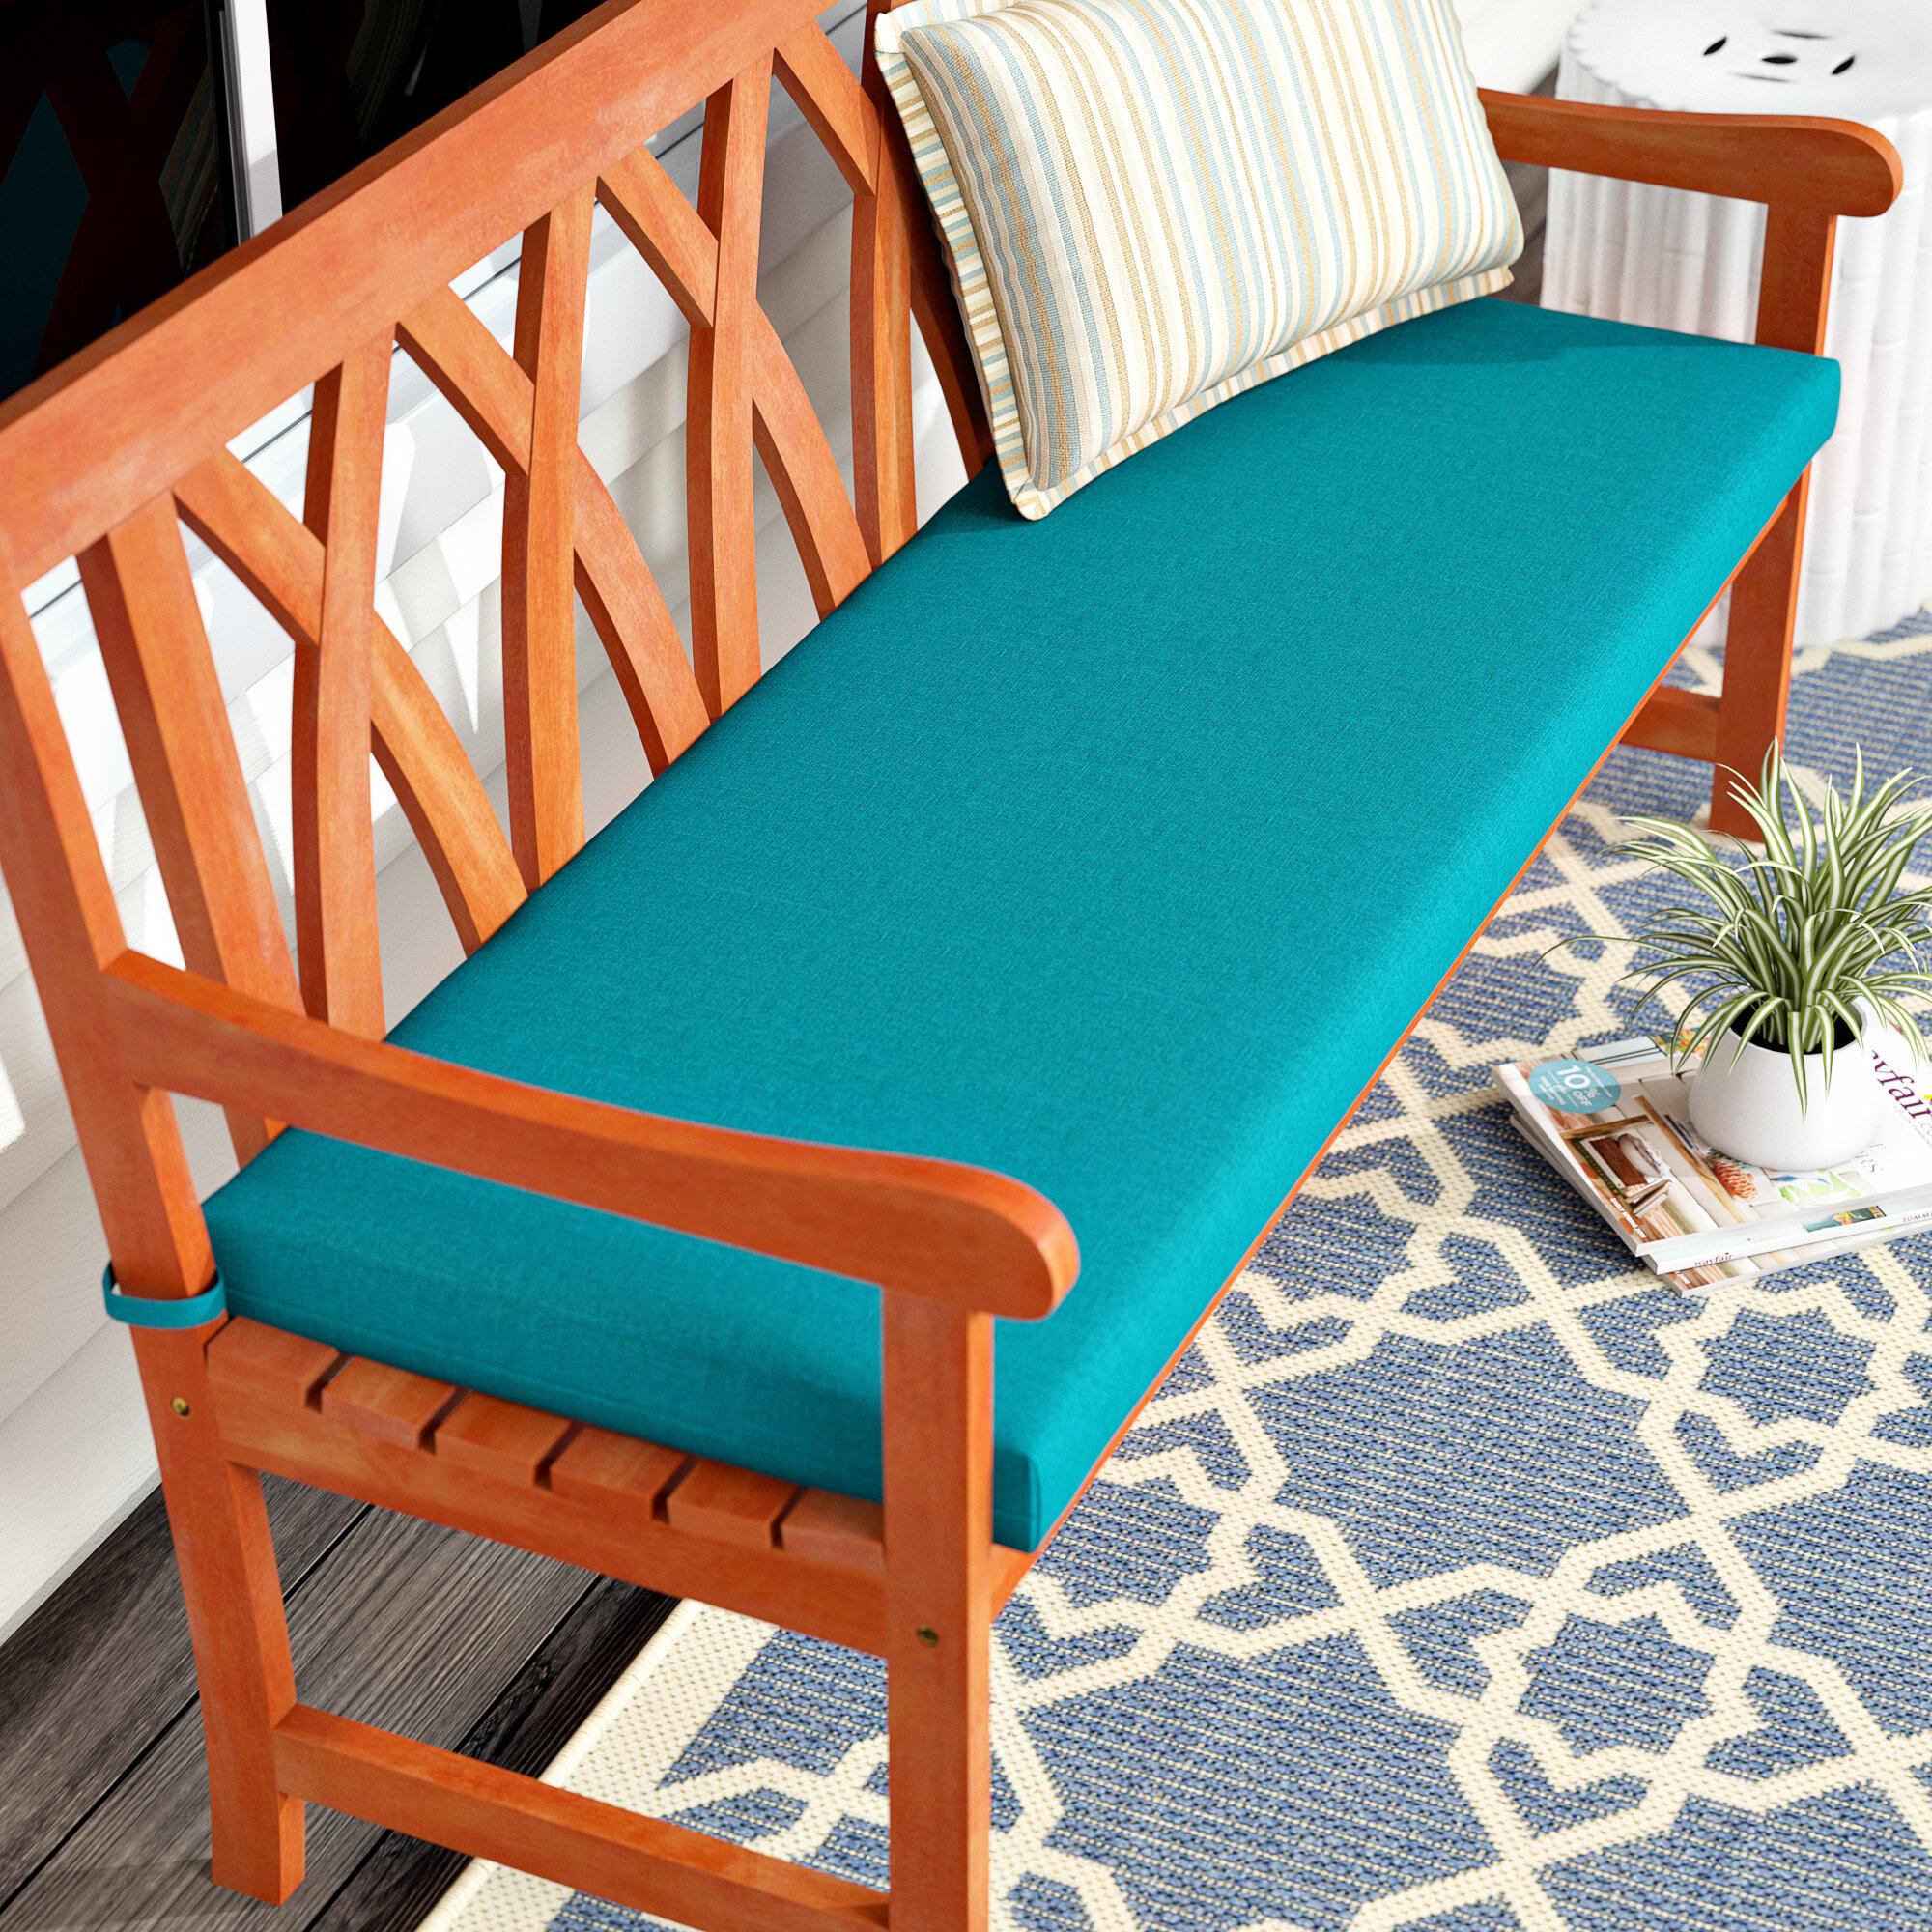 Indoor Outdoor Bench Cushion